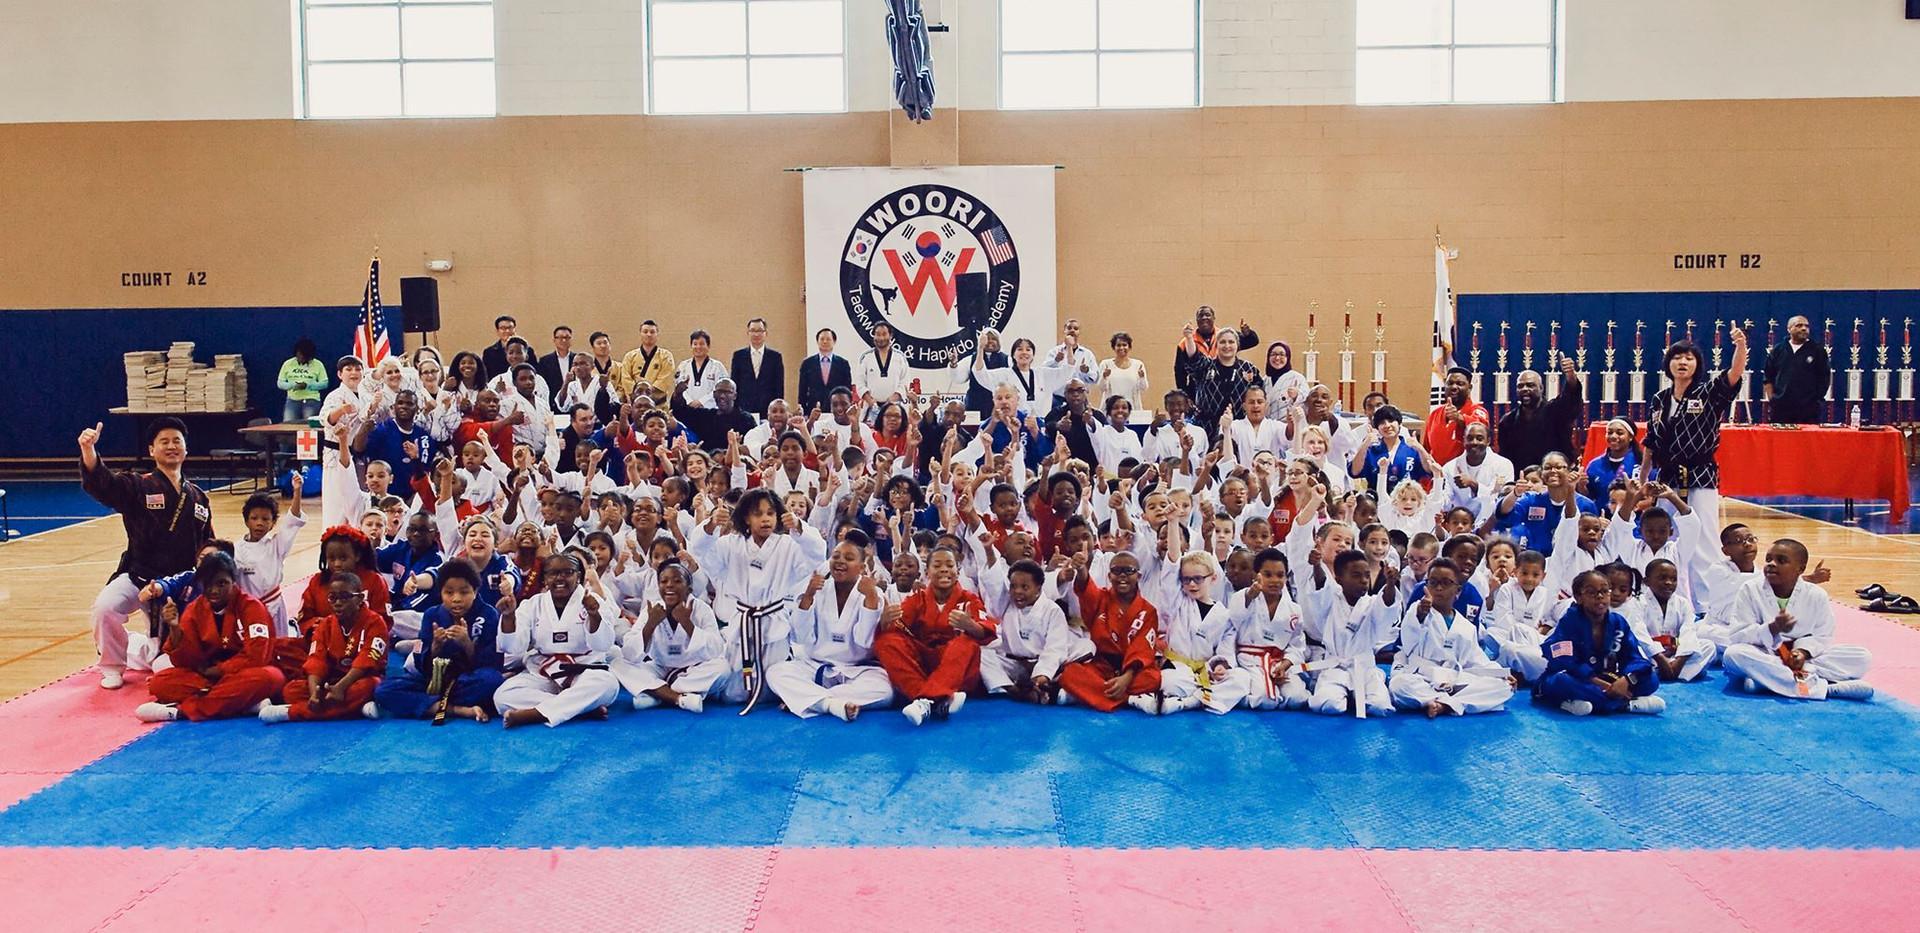 Woori Taekwondo Group Photo